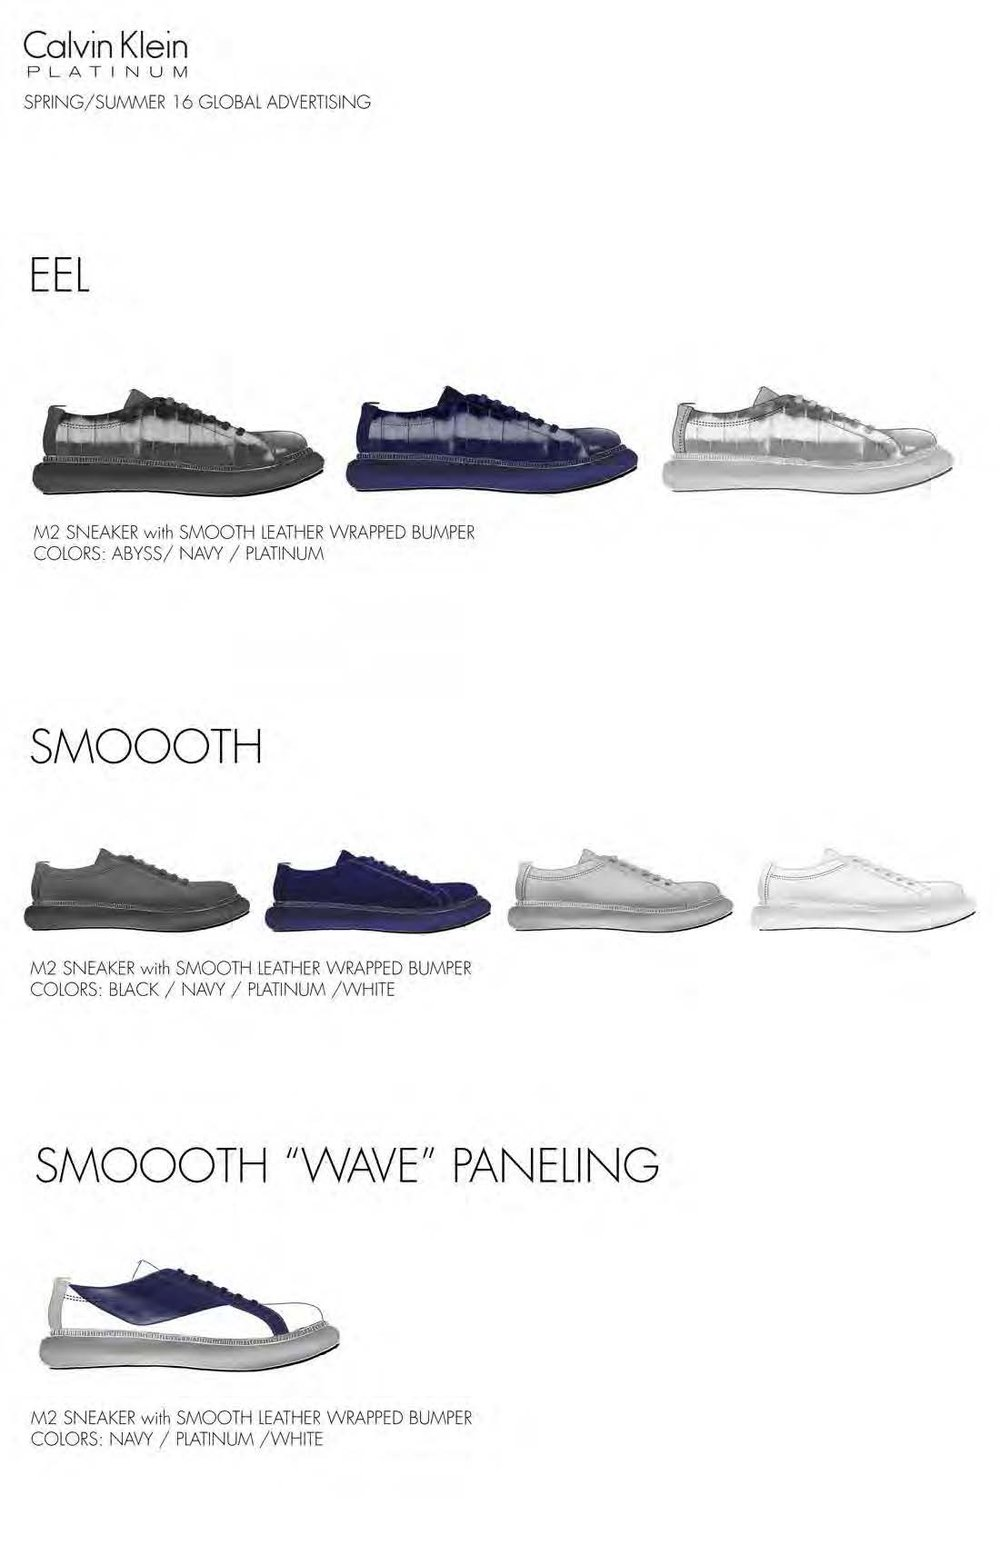 7.KGRESS Portfolio-SS16 CKP AD Footwear_Page_10.jpg